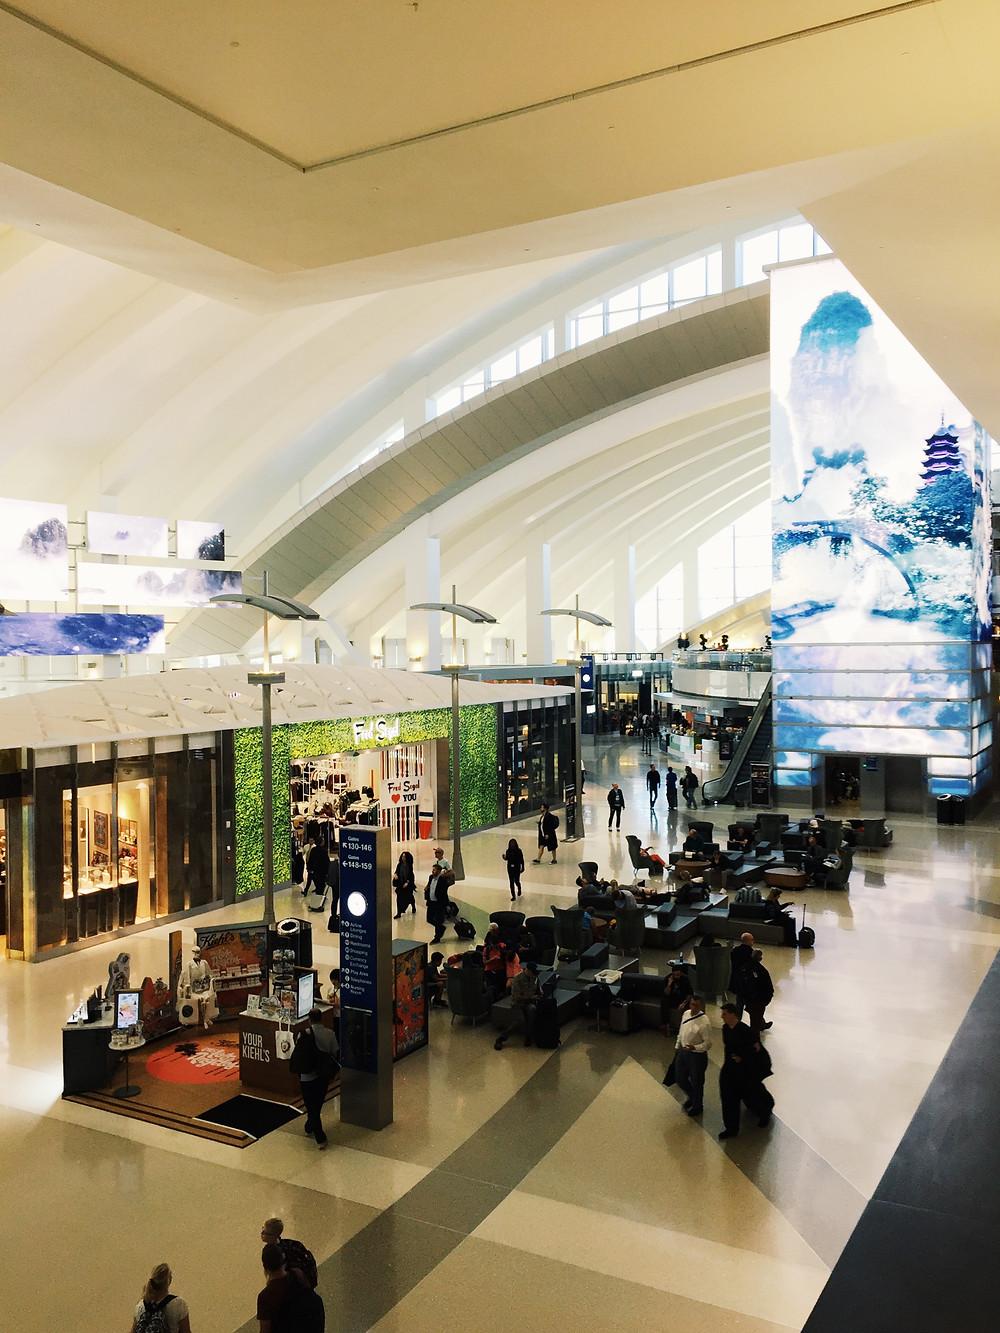 LAX, TBIT International Terminal Atrium